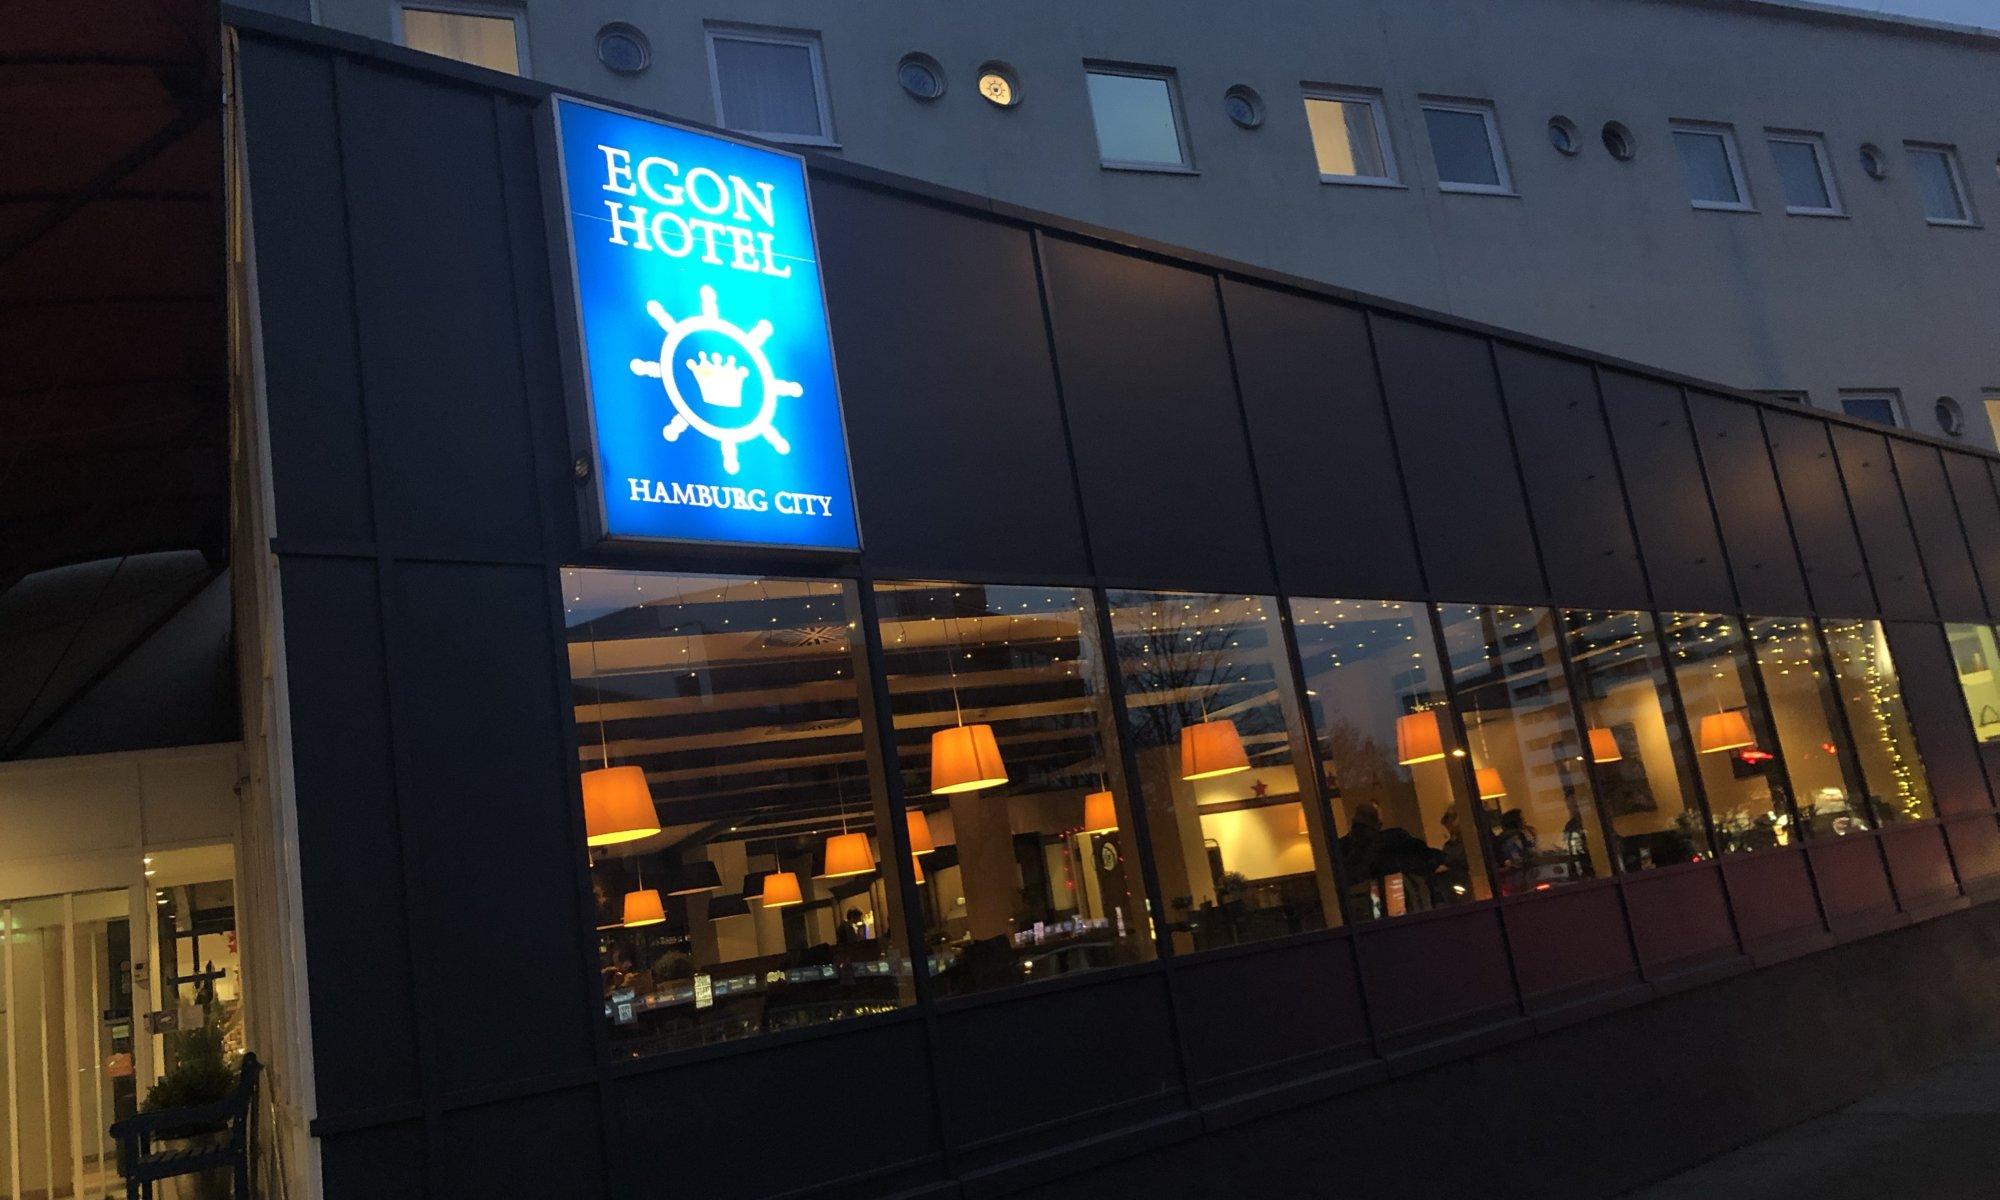 Egon Hotel, Hamburg